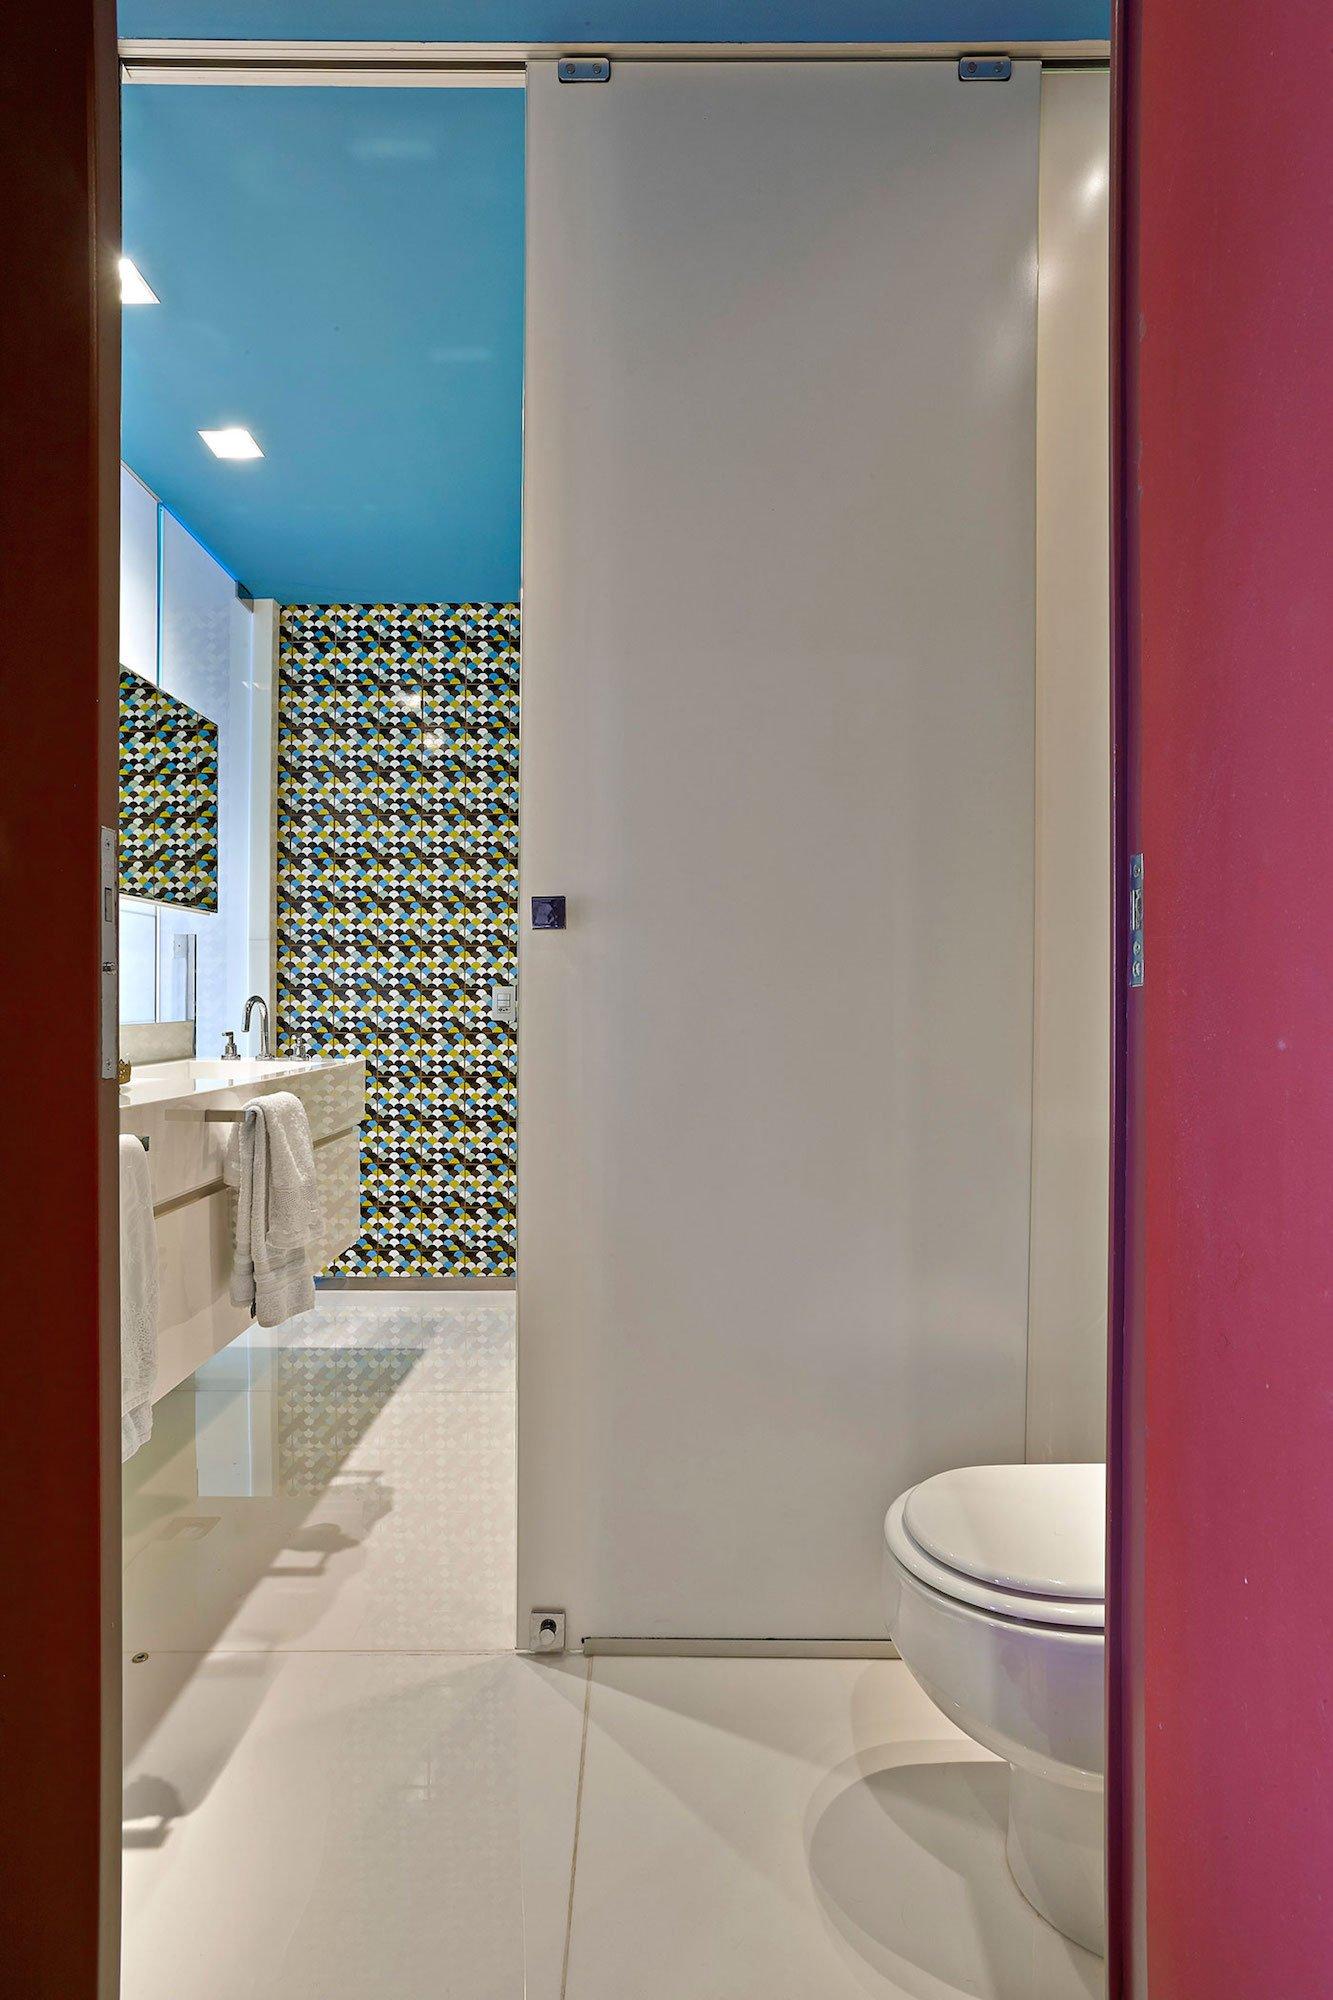 Apartment-in-Belo-Horizonte-22